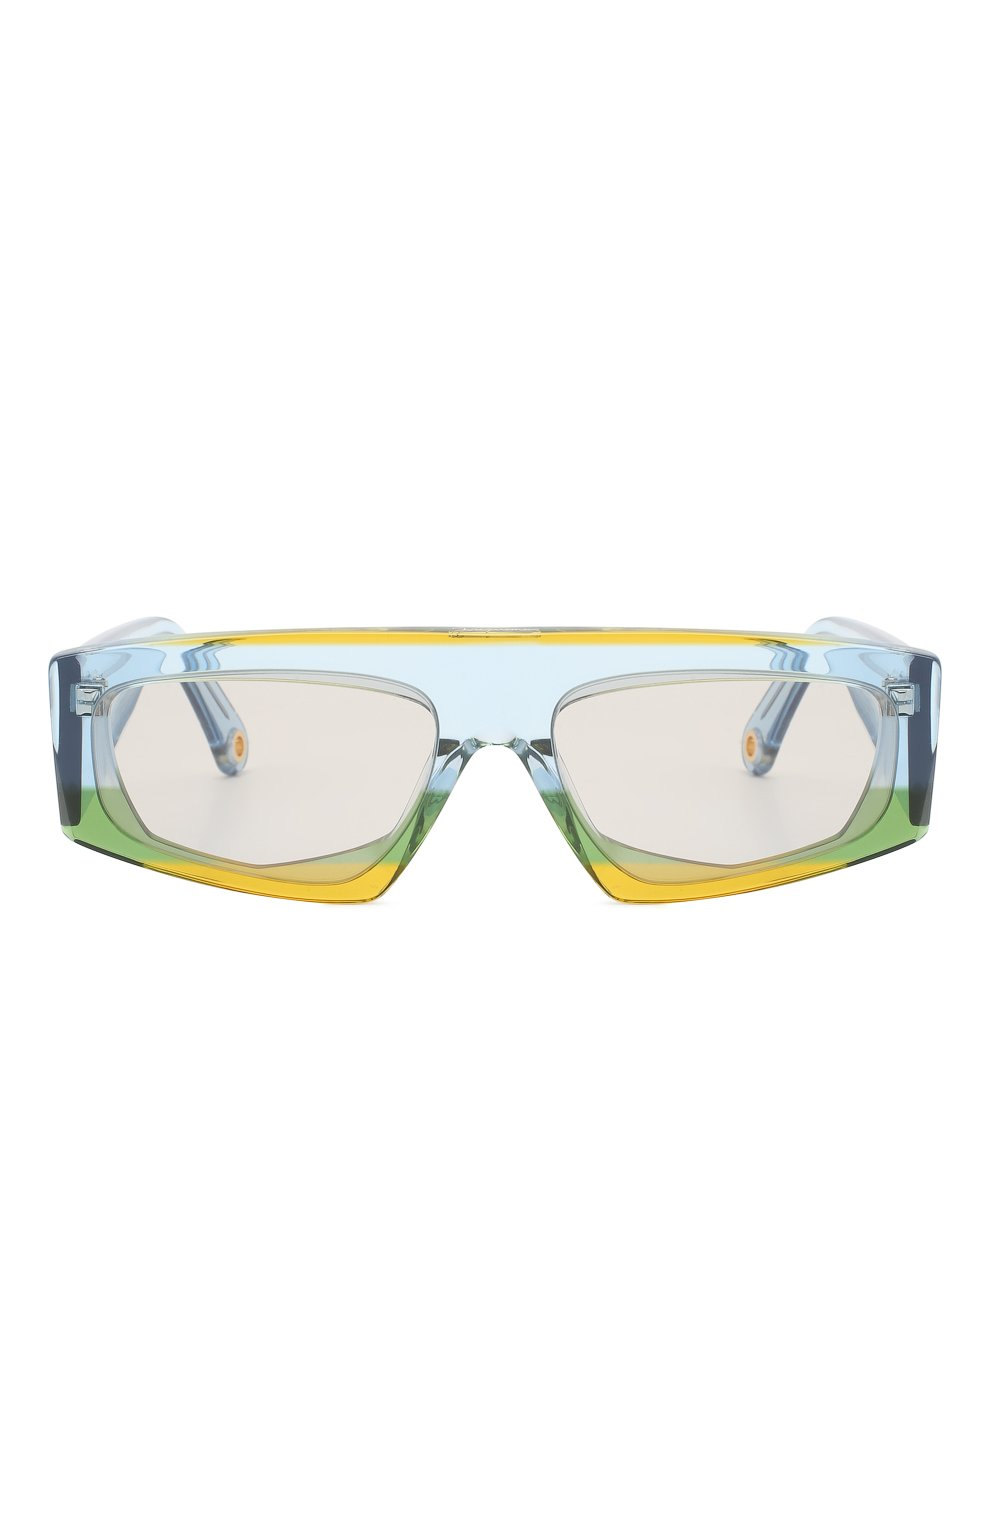 Женские солнцезащитные очки JACQUEMUS голубого цвета, арт. LES LUNETTES YAUC0 MULTI YELL0W | Фото 3